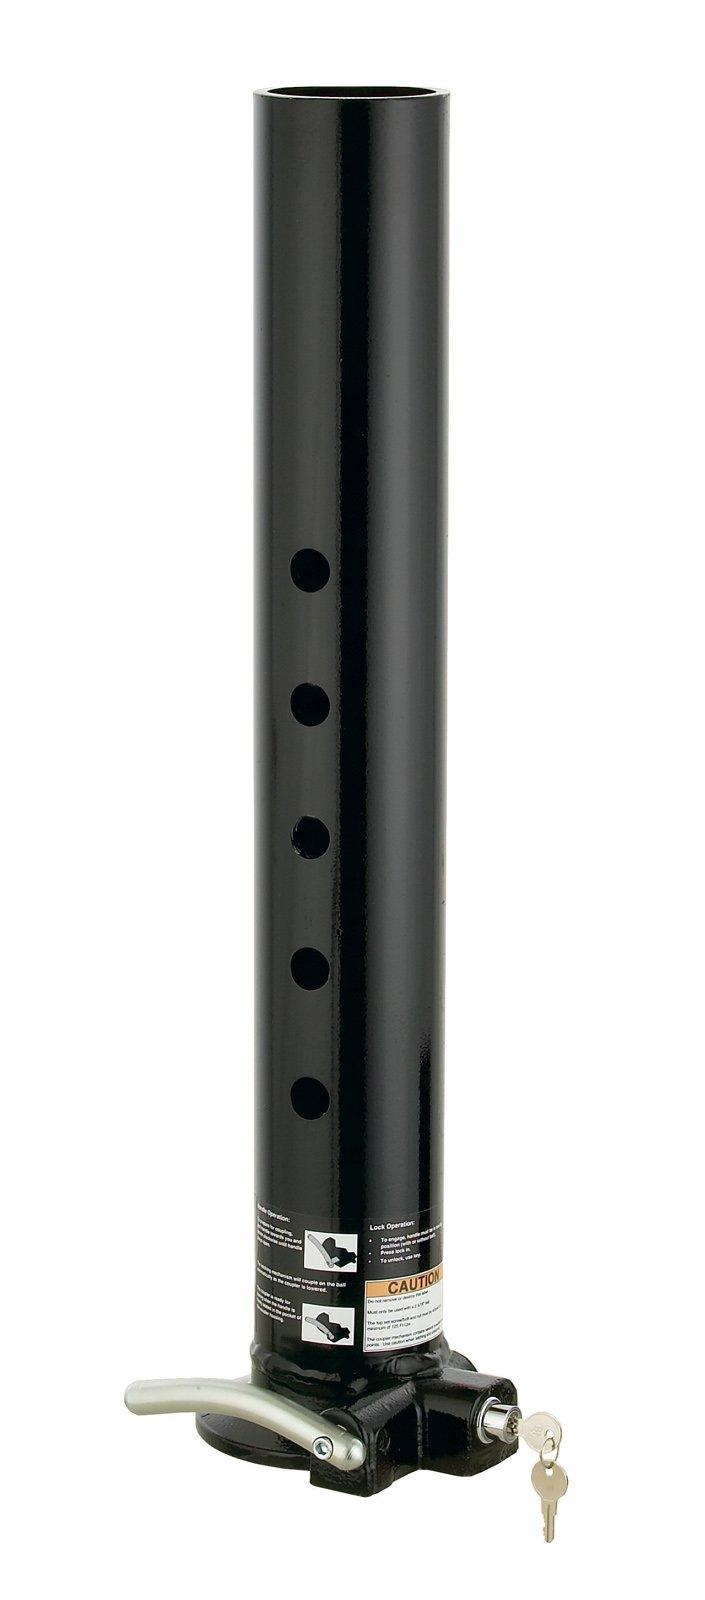 B&W Trailer Hitches GNC4250 Defender Locking Coupler